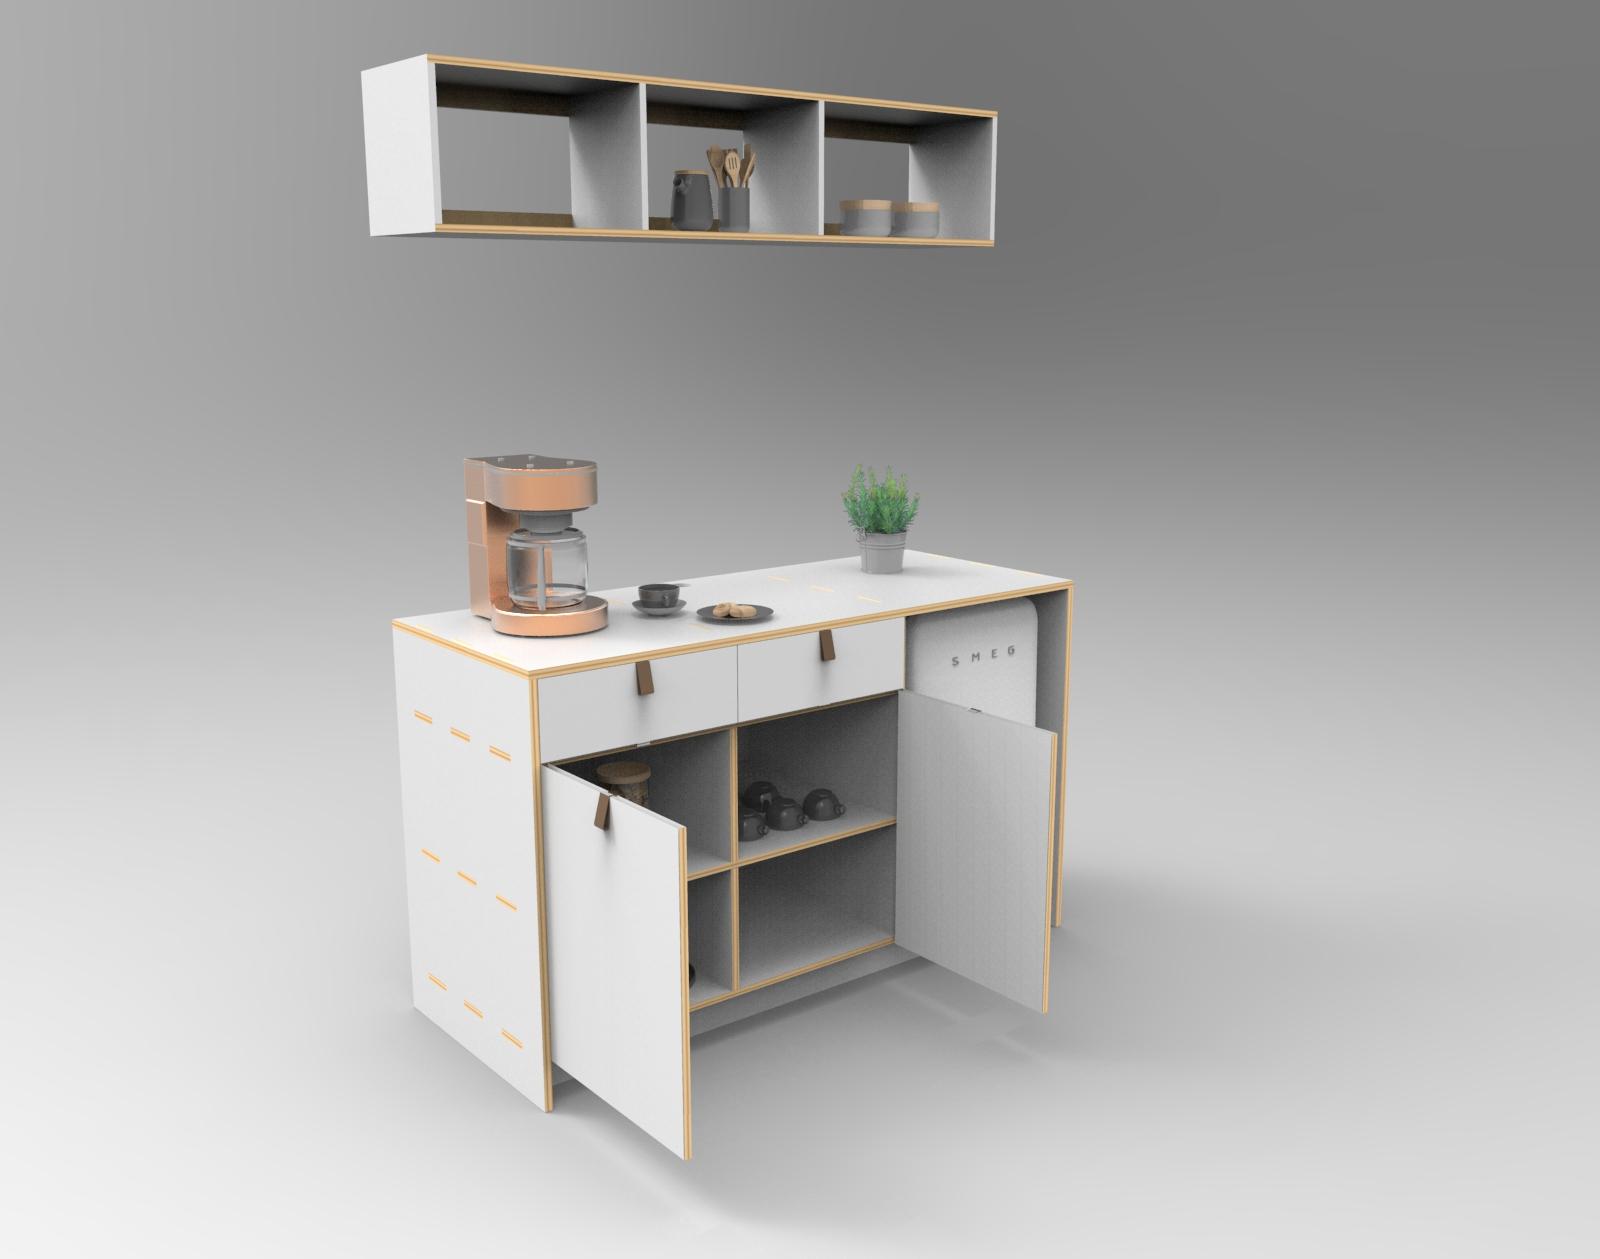 Mueble Café abierto.15.jpg